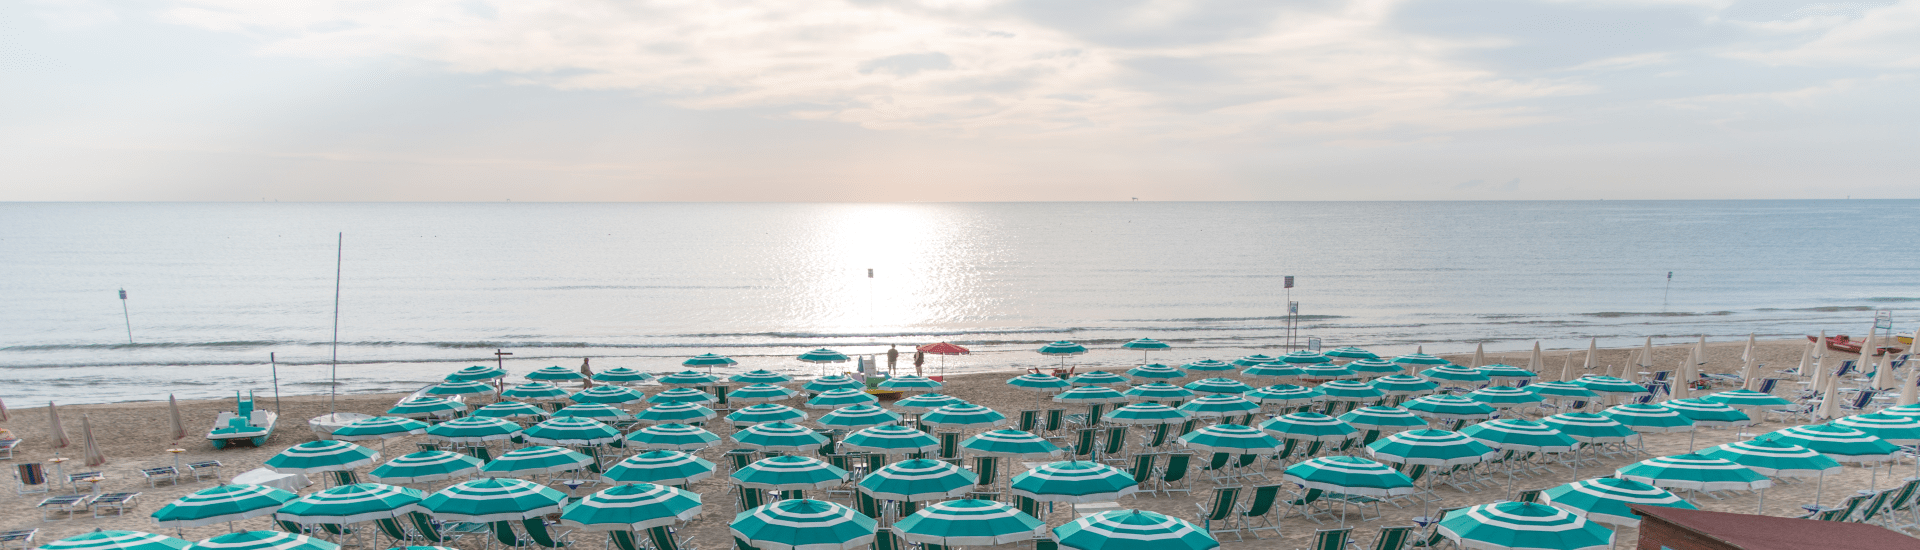 spiaggia_hotel_saint_tropez_pineto-min